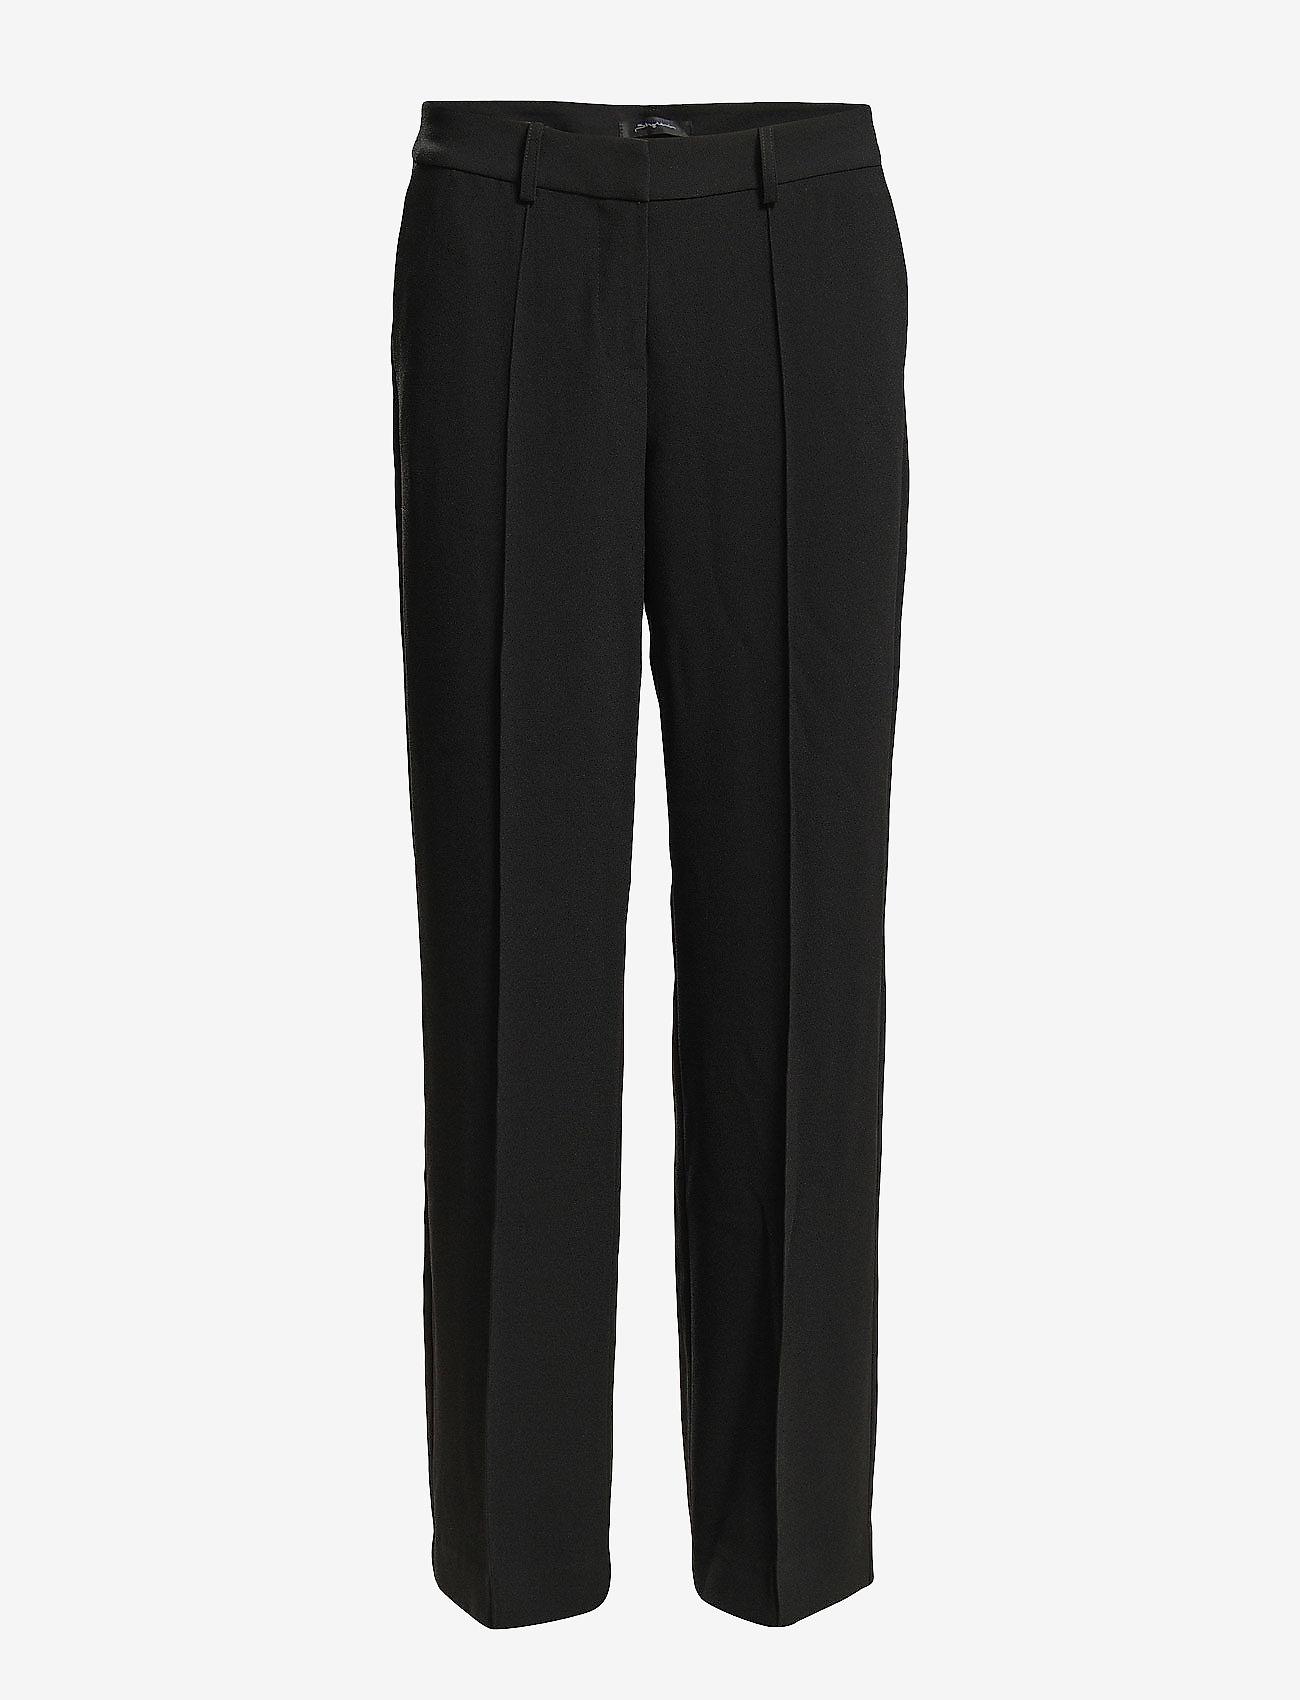 Stylein - BORIS TROUSERS - bikses ar taisnām starām - black - 1